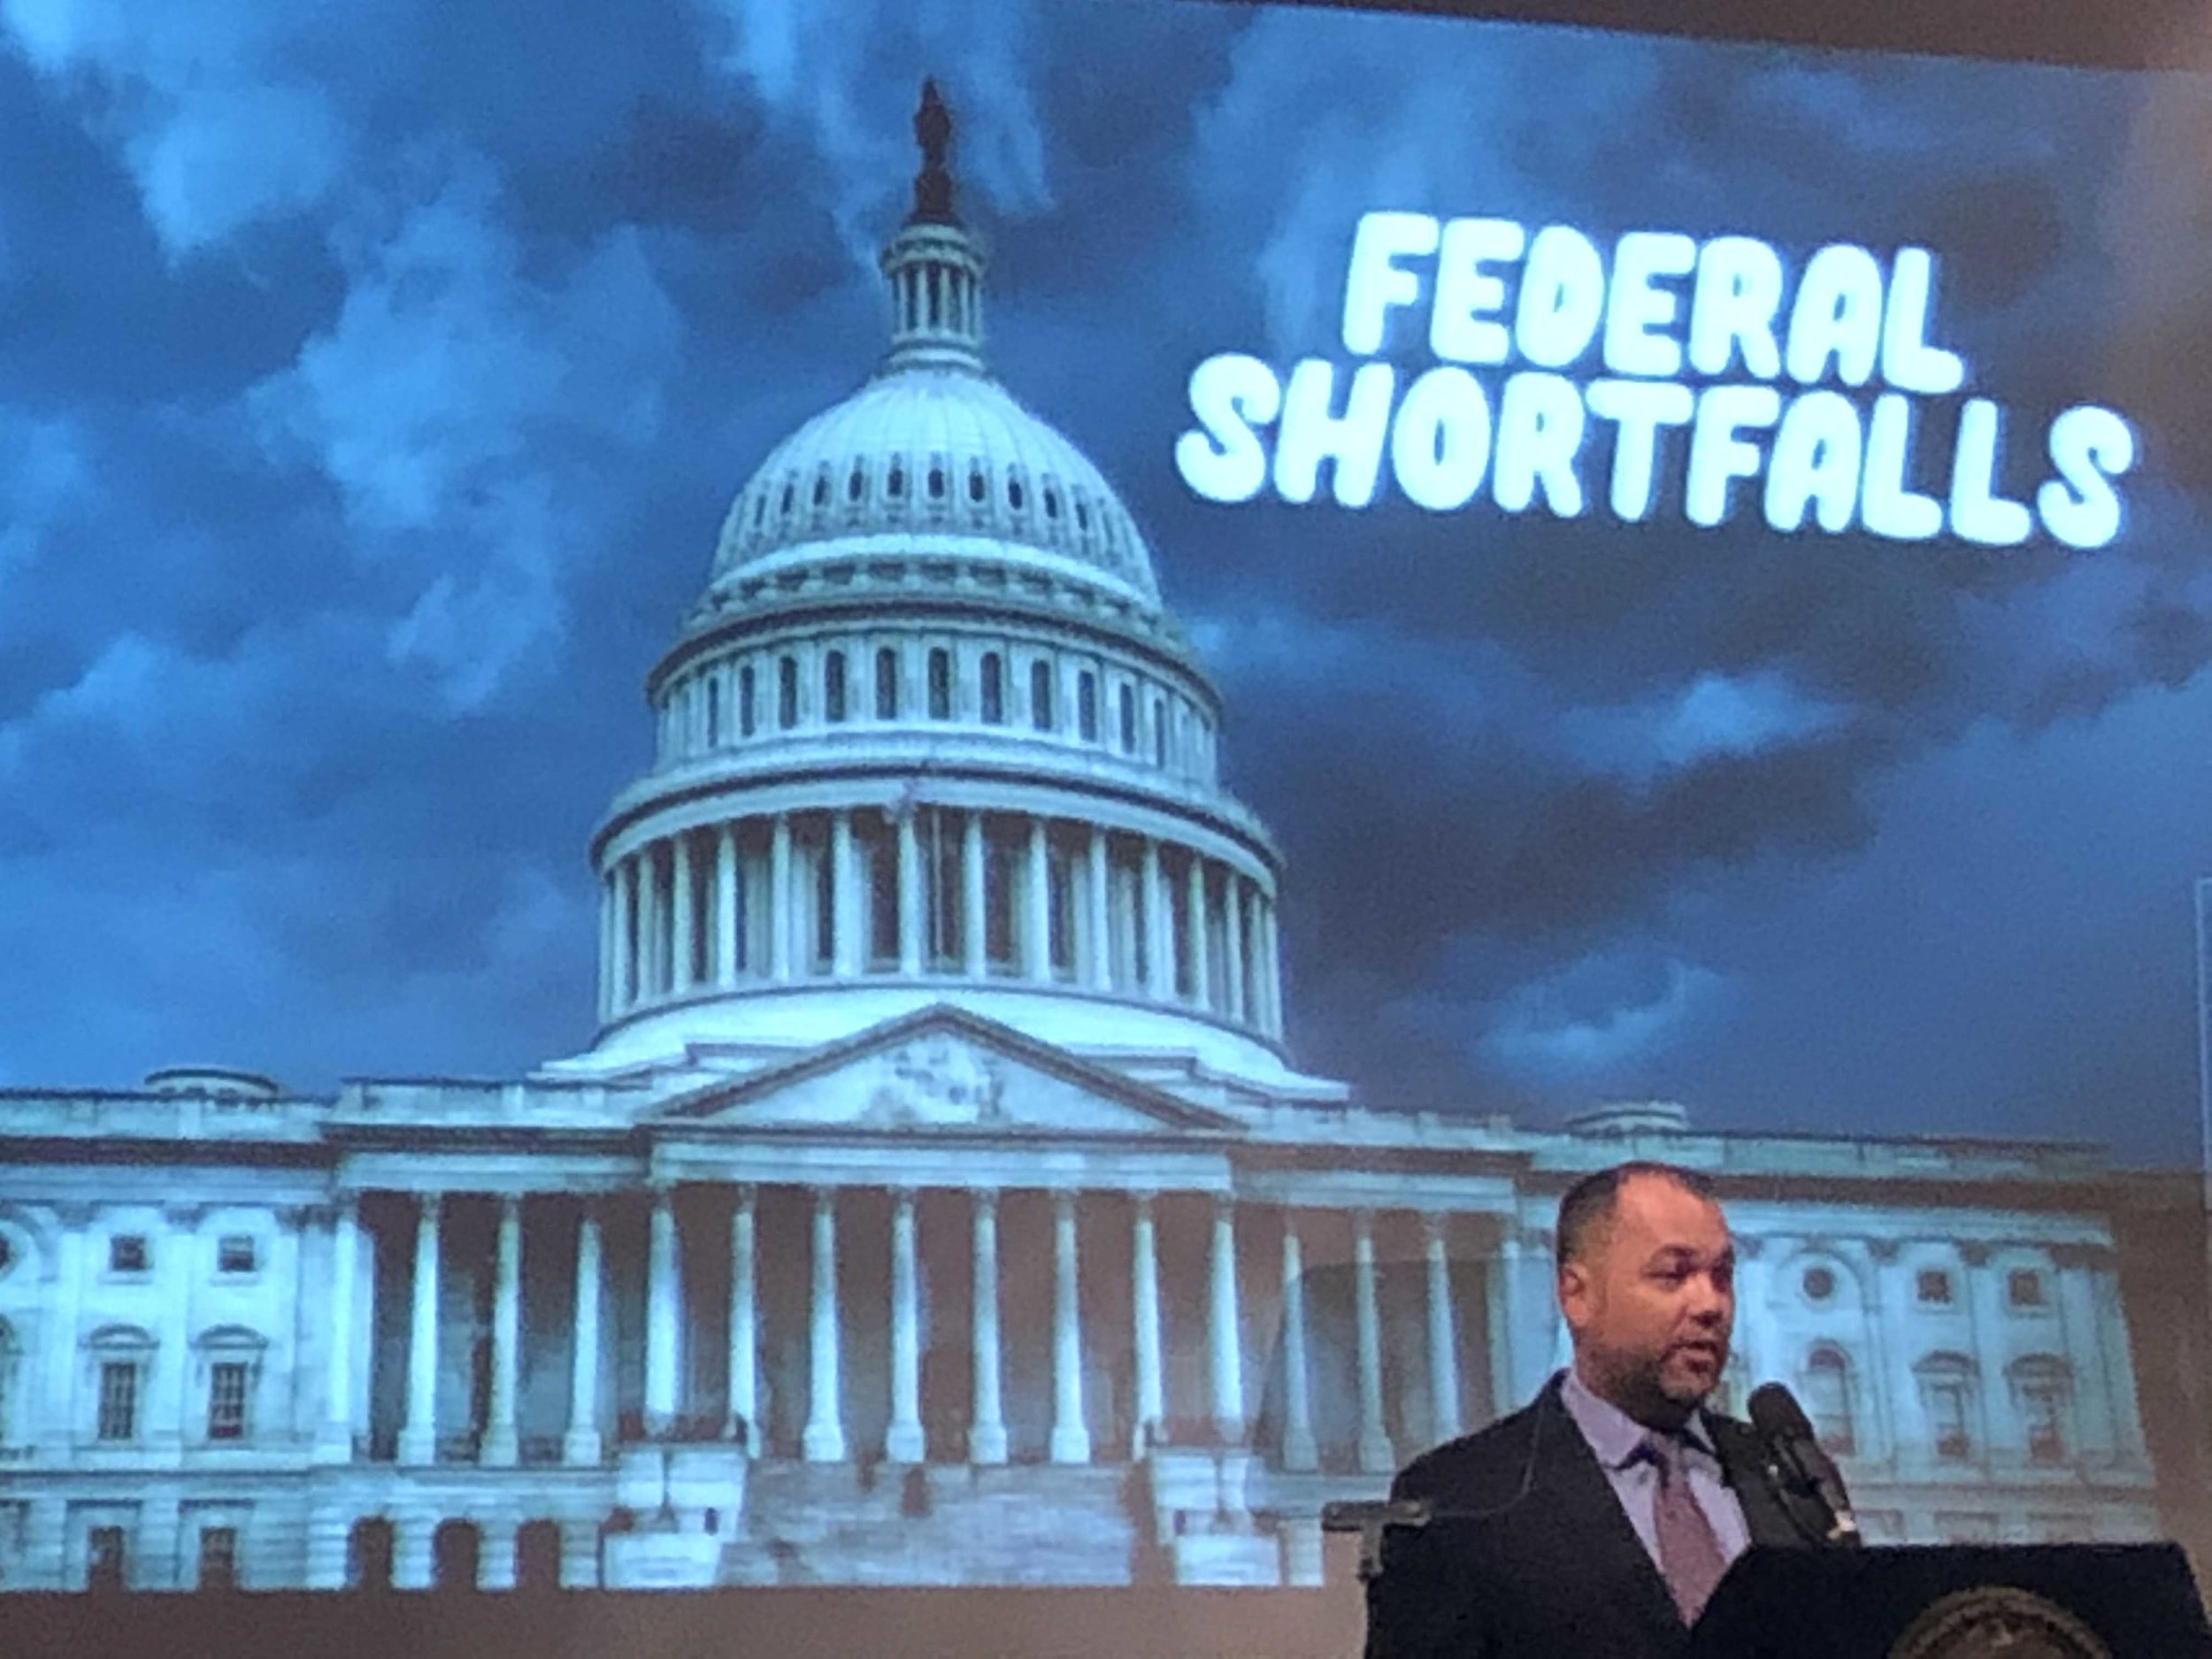 Corey_Johnson_GFEinNYC_Agenda.jpg